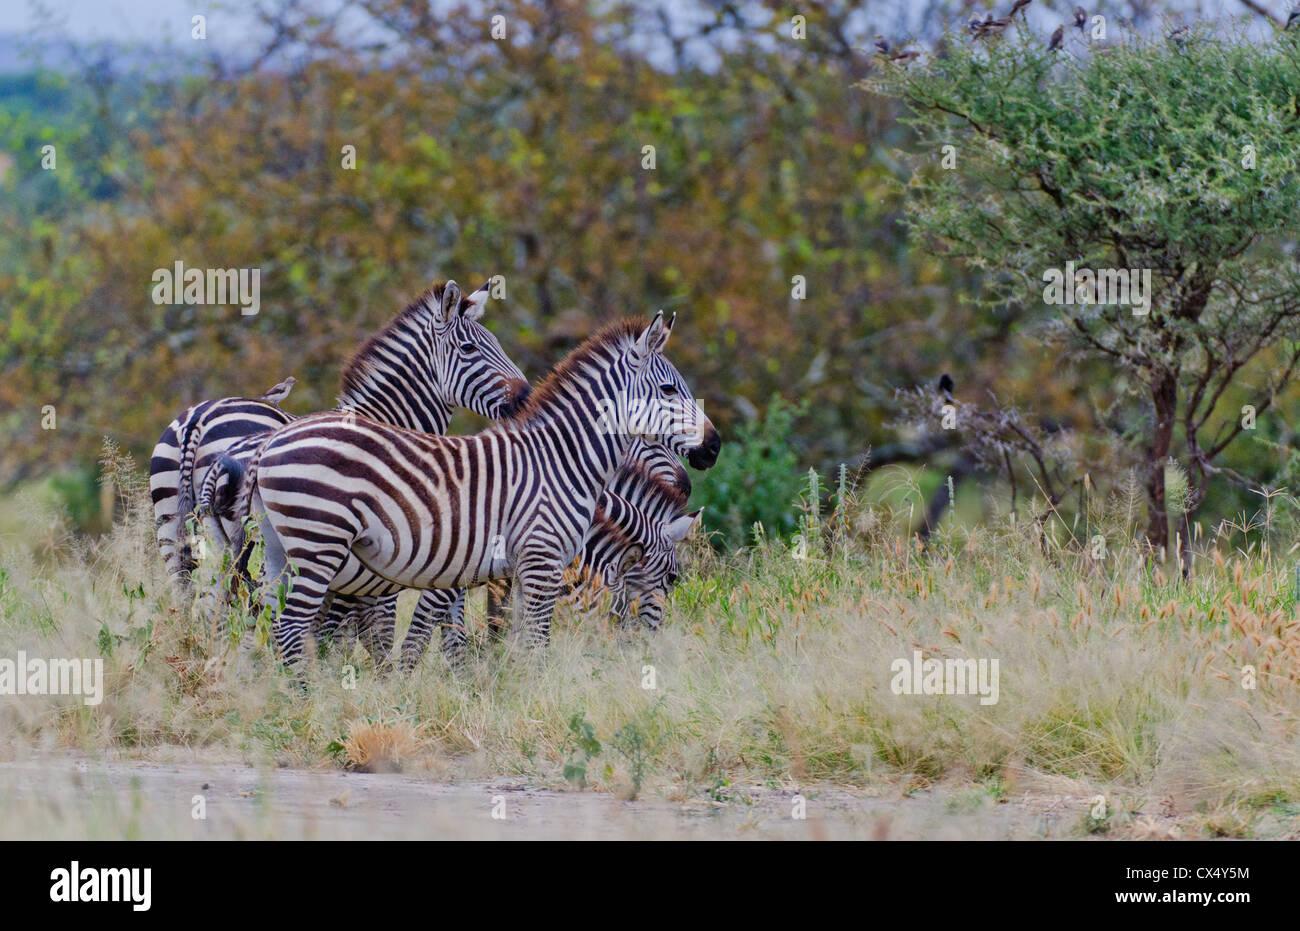 Amboseli National Park Kenya Africa safari zebra wild in reserve Amboseli  - Stock Image